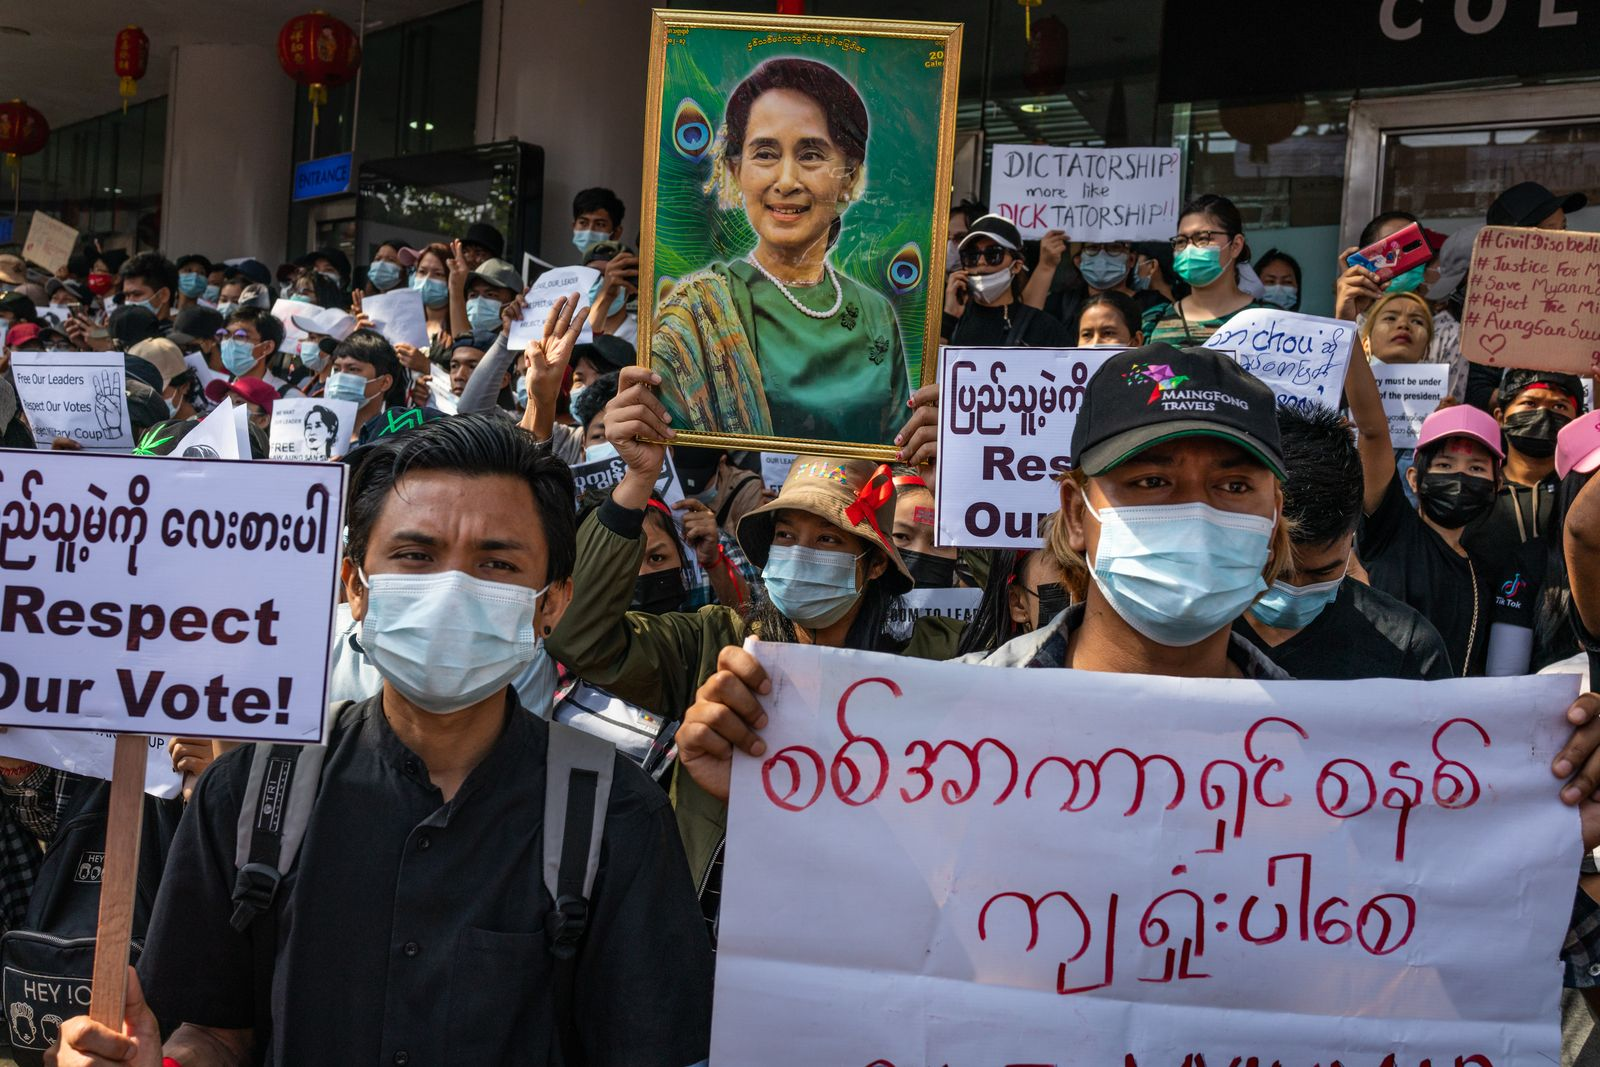 Protesters Take To Yangon's Streets Despite Martial Law